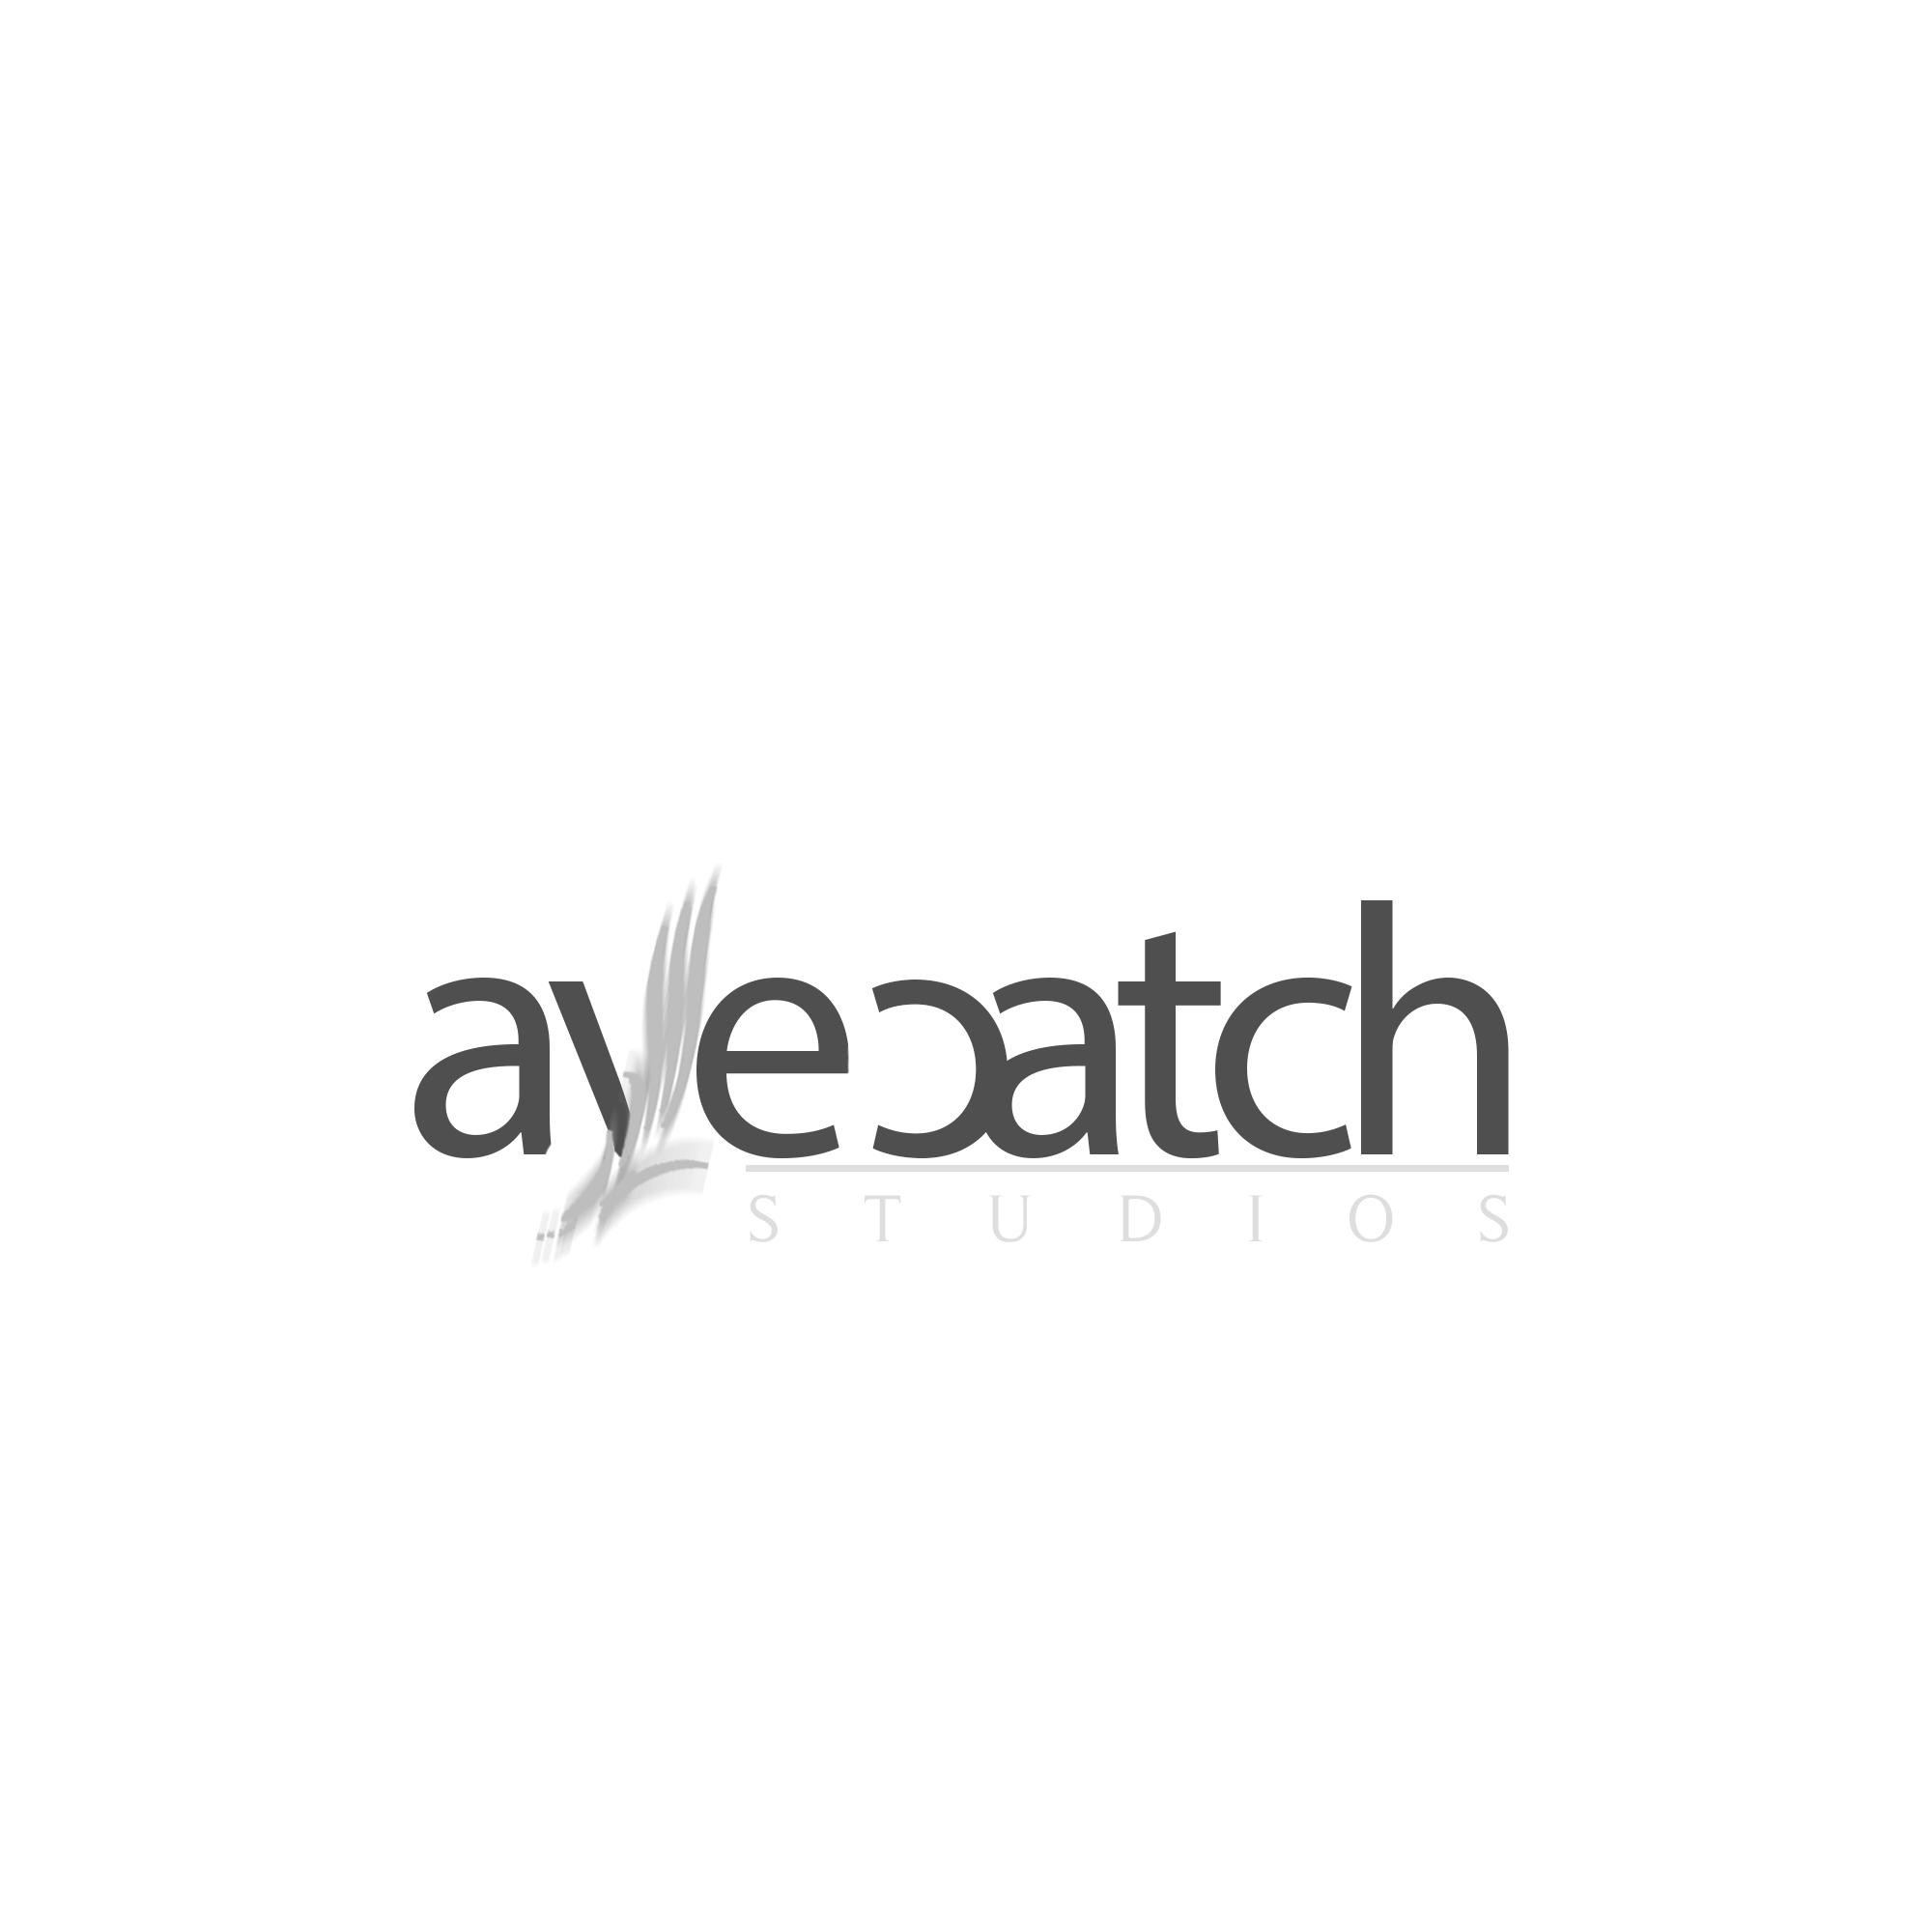 ayecatch_bw